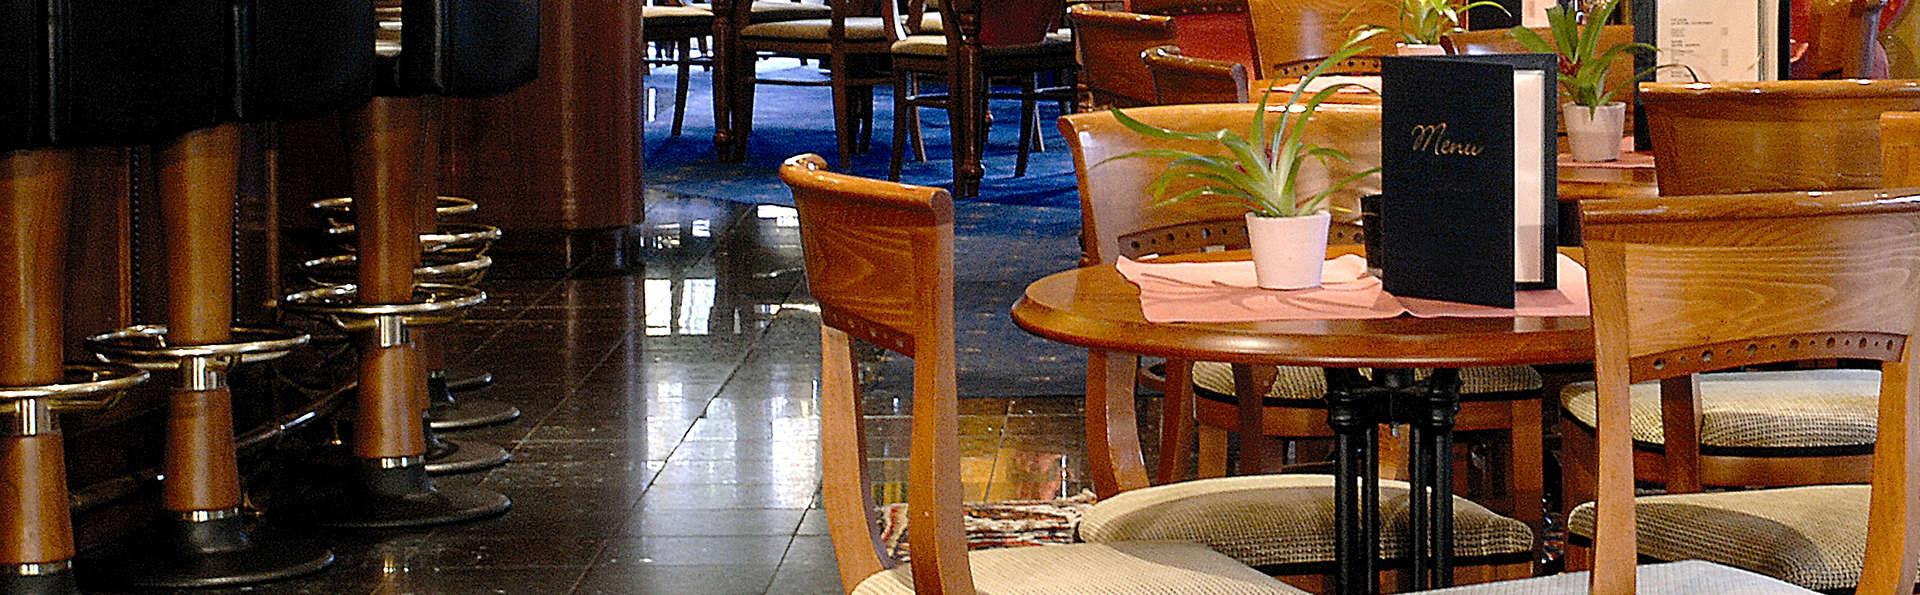 Thon Hotel Brussels Airport - Edit_Bar.jpg